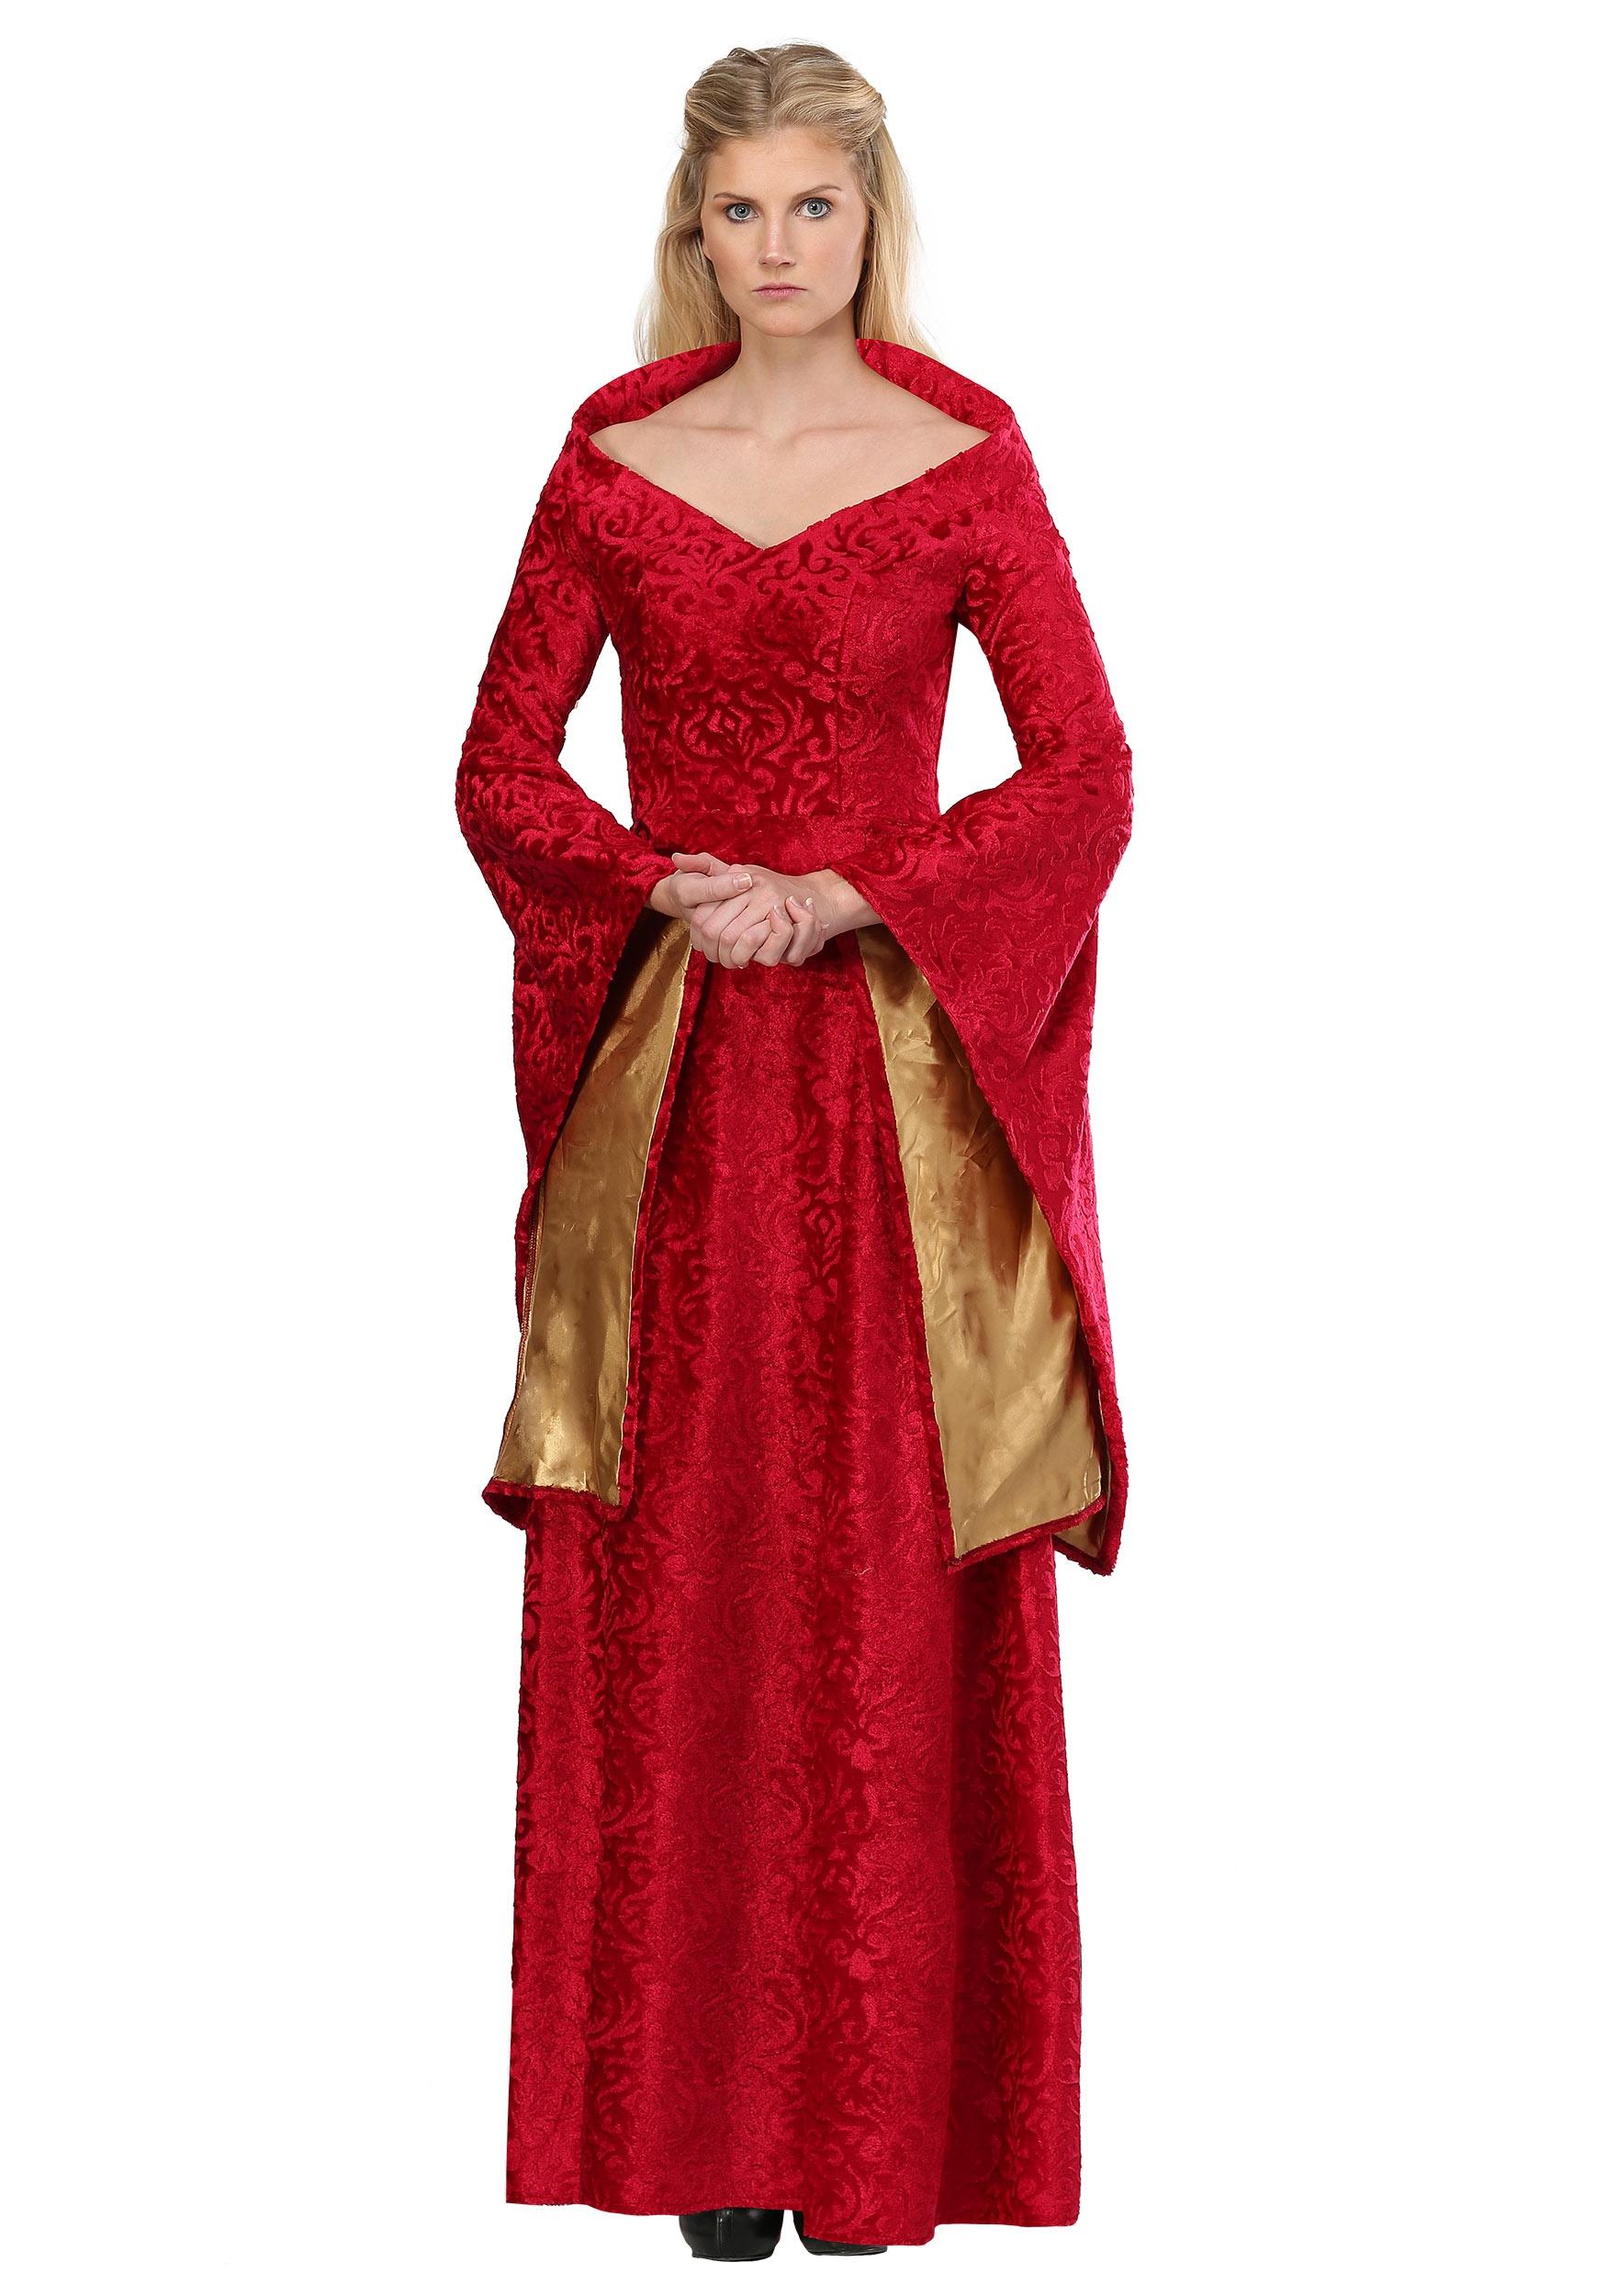 Lion Queen Costume for Women